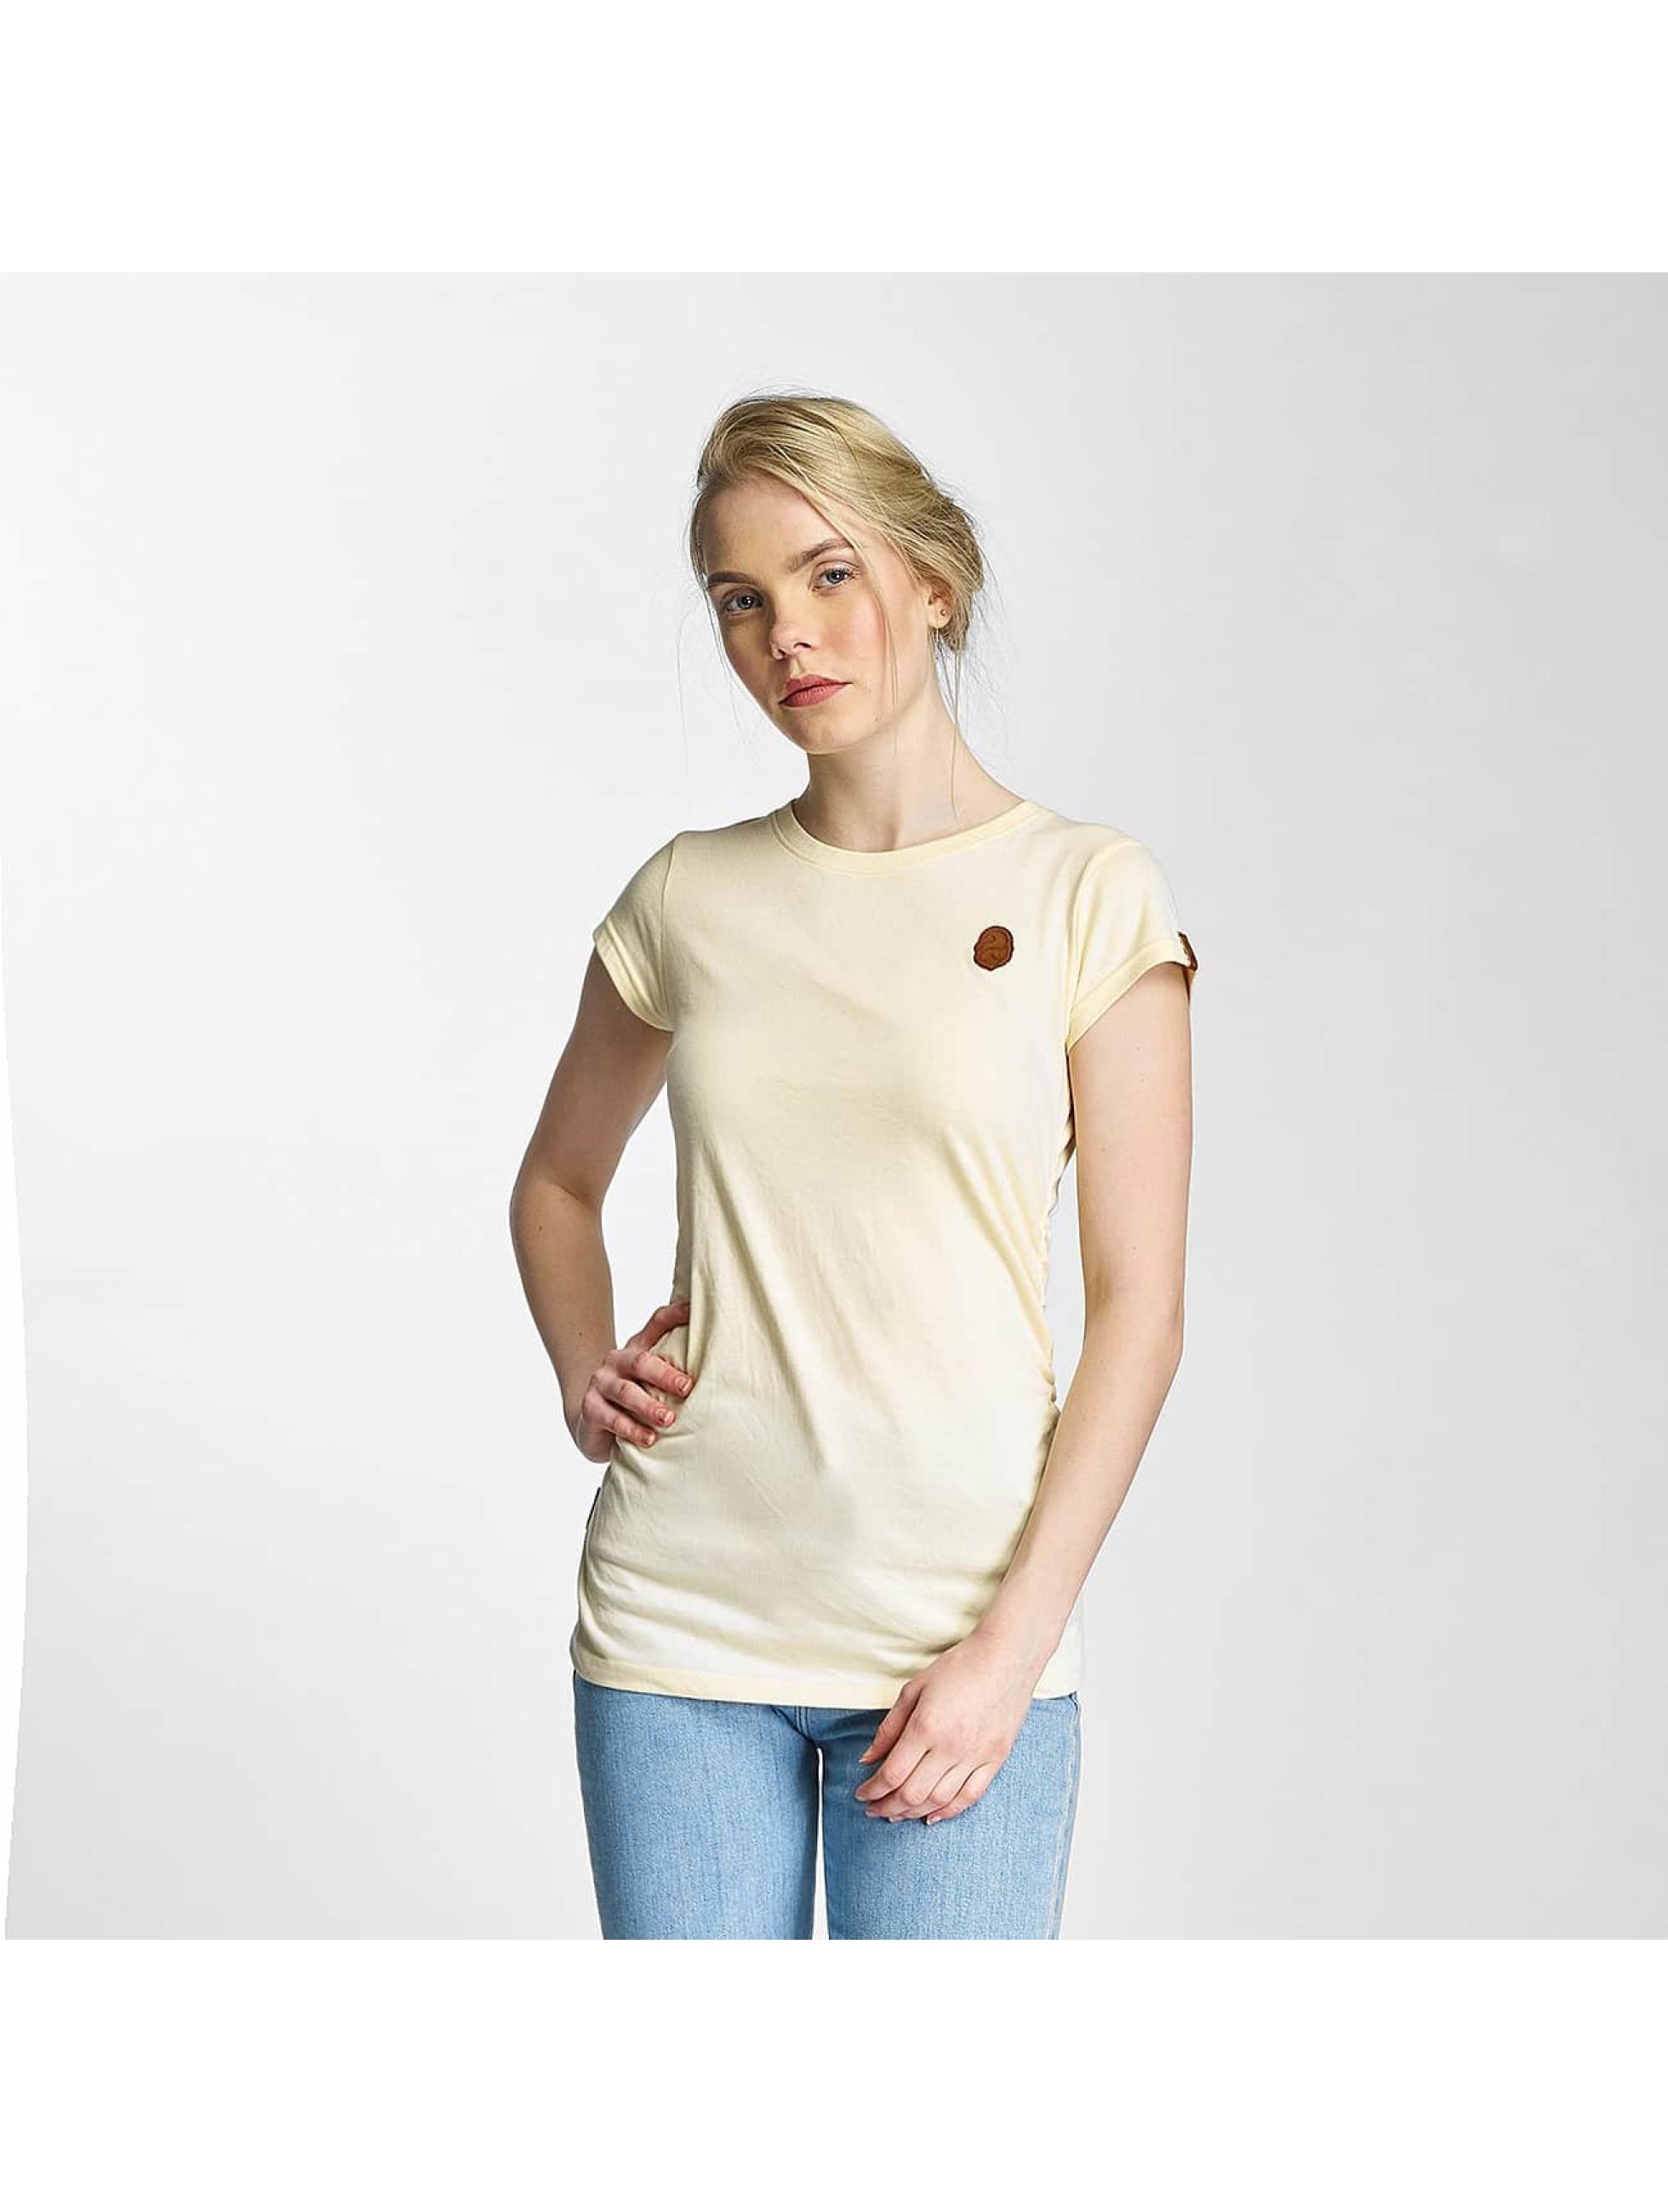 b77b762c6bcbf Alife & Kickin | Lilly beige Femme T-Shirt Alife & Kickin acheter pas cher  Haut 332802